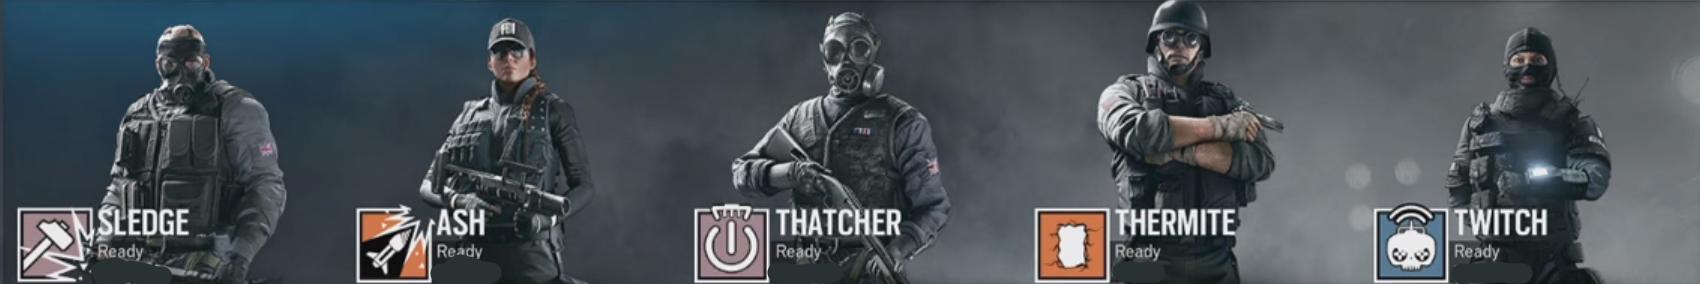 Steam Community :: Guide :: Attackers E-sports Loadout